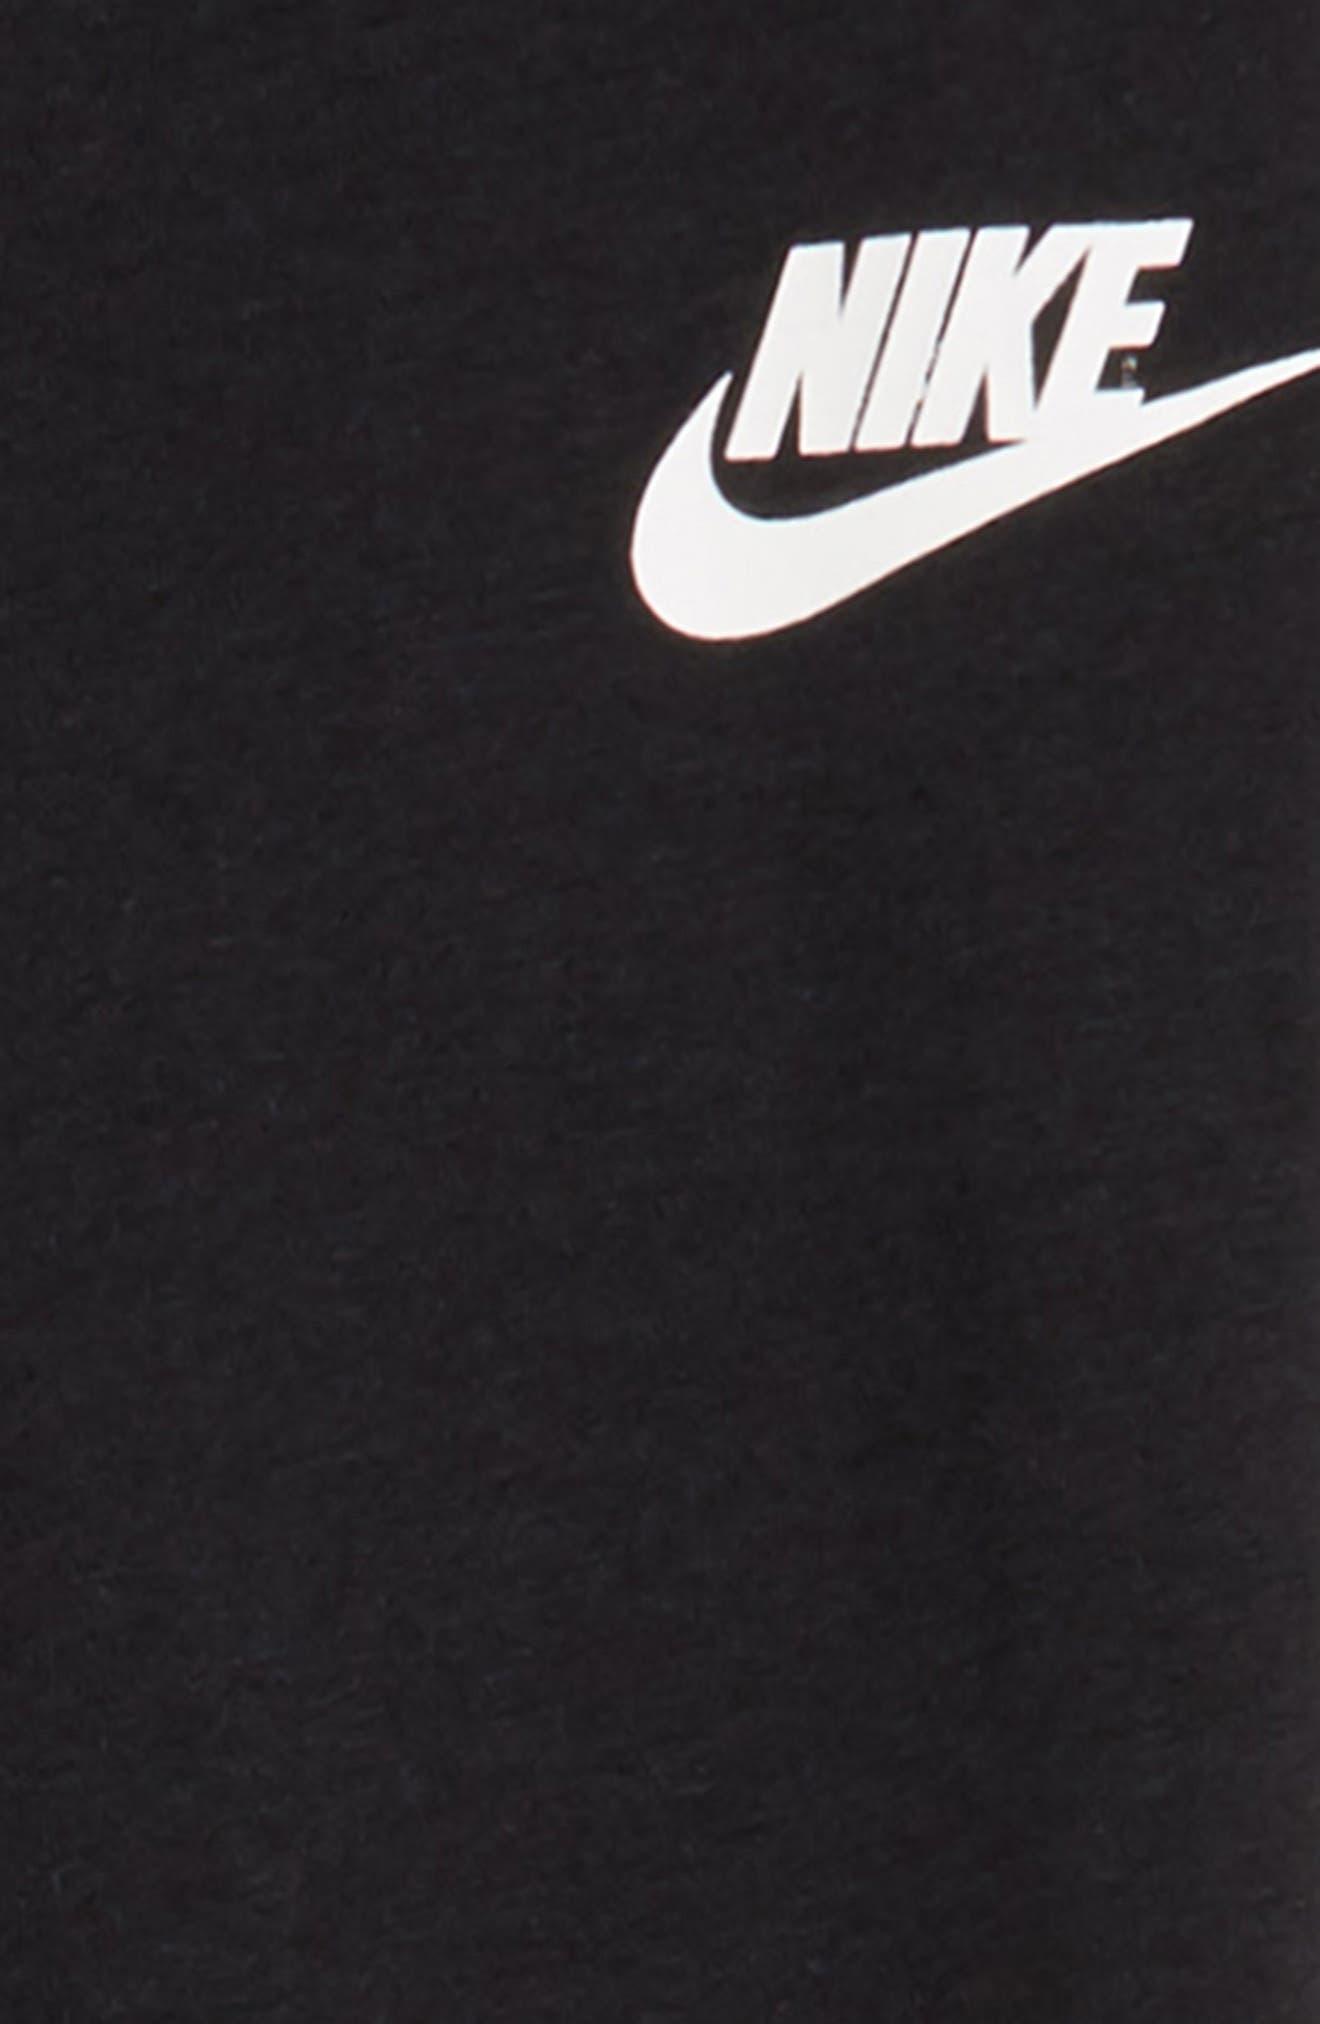 Sportswear PE Pants,                             Alternate thumbnail 2, color,                             BLACK/ WHITE